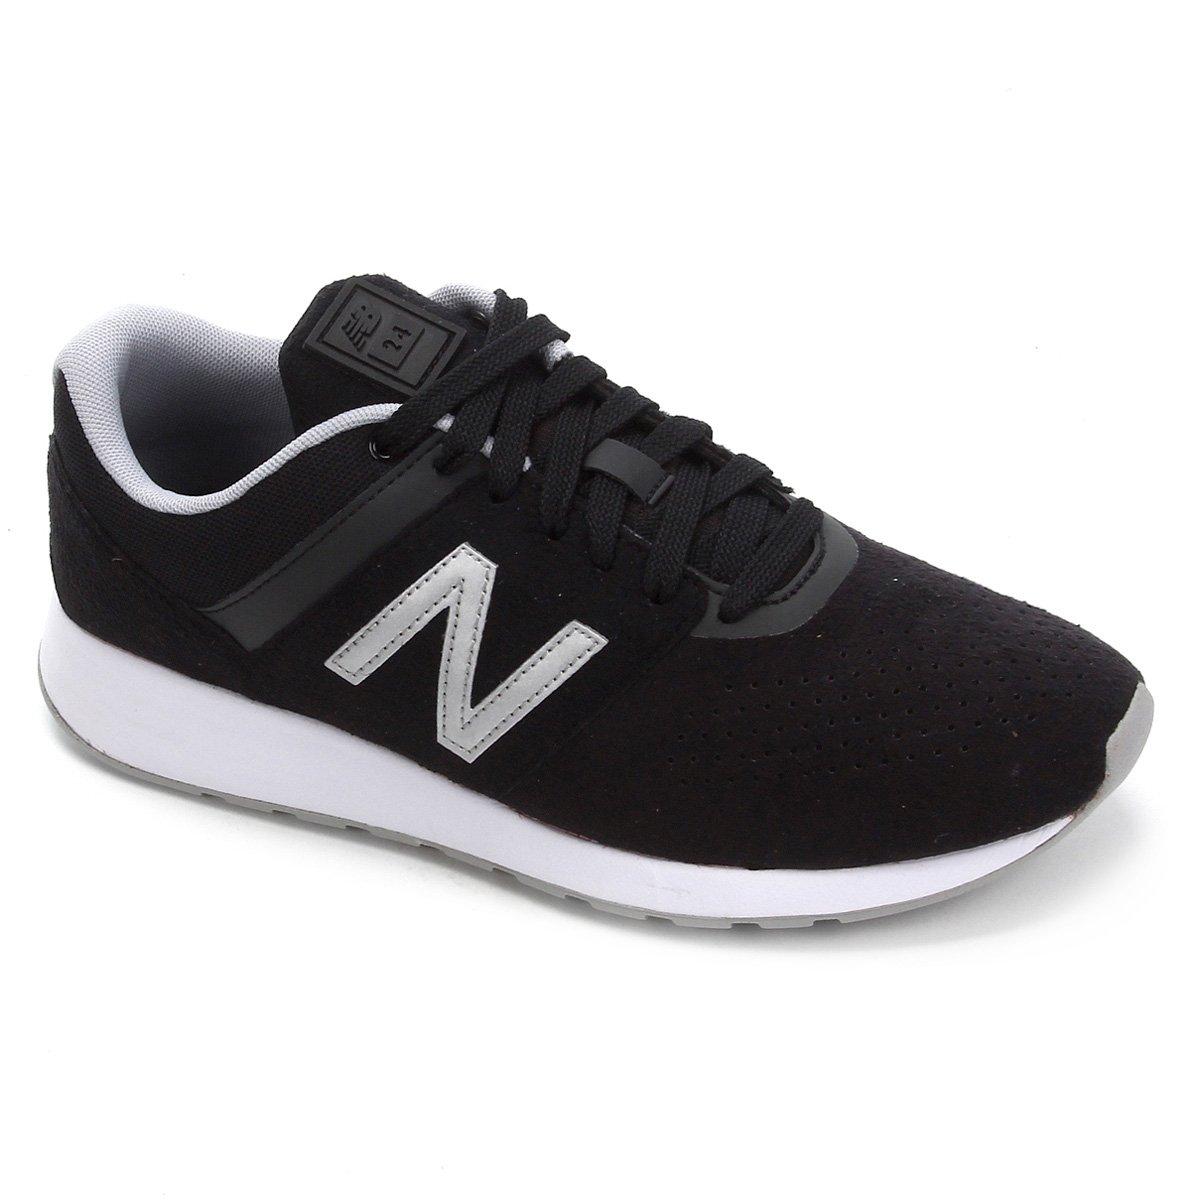 Tênis New Balance MRL24 Masculino - Tam: 39